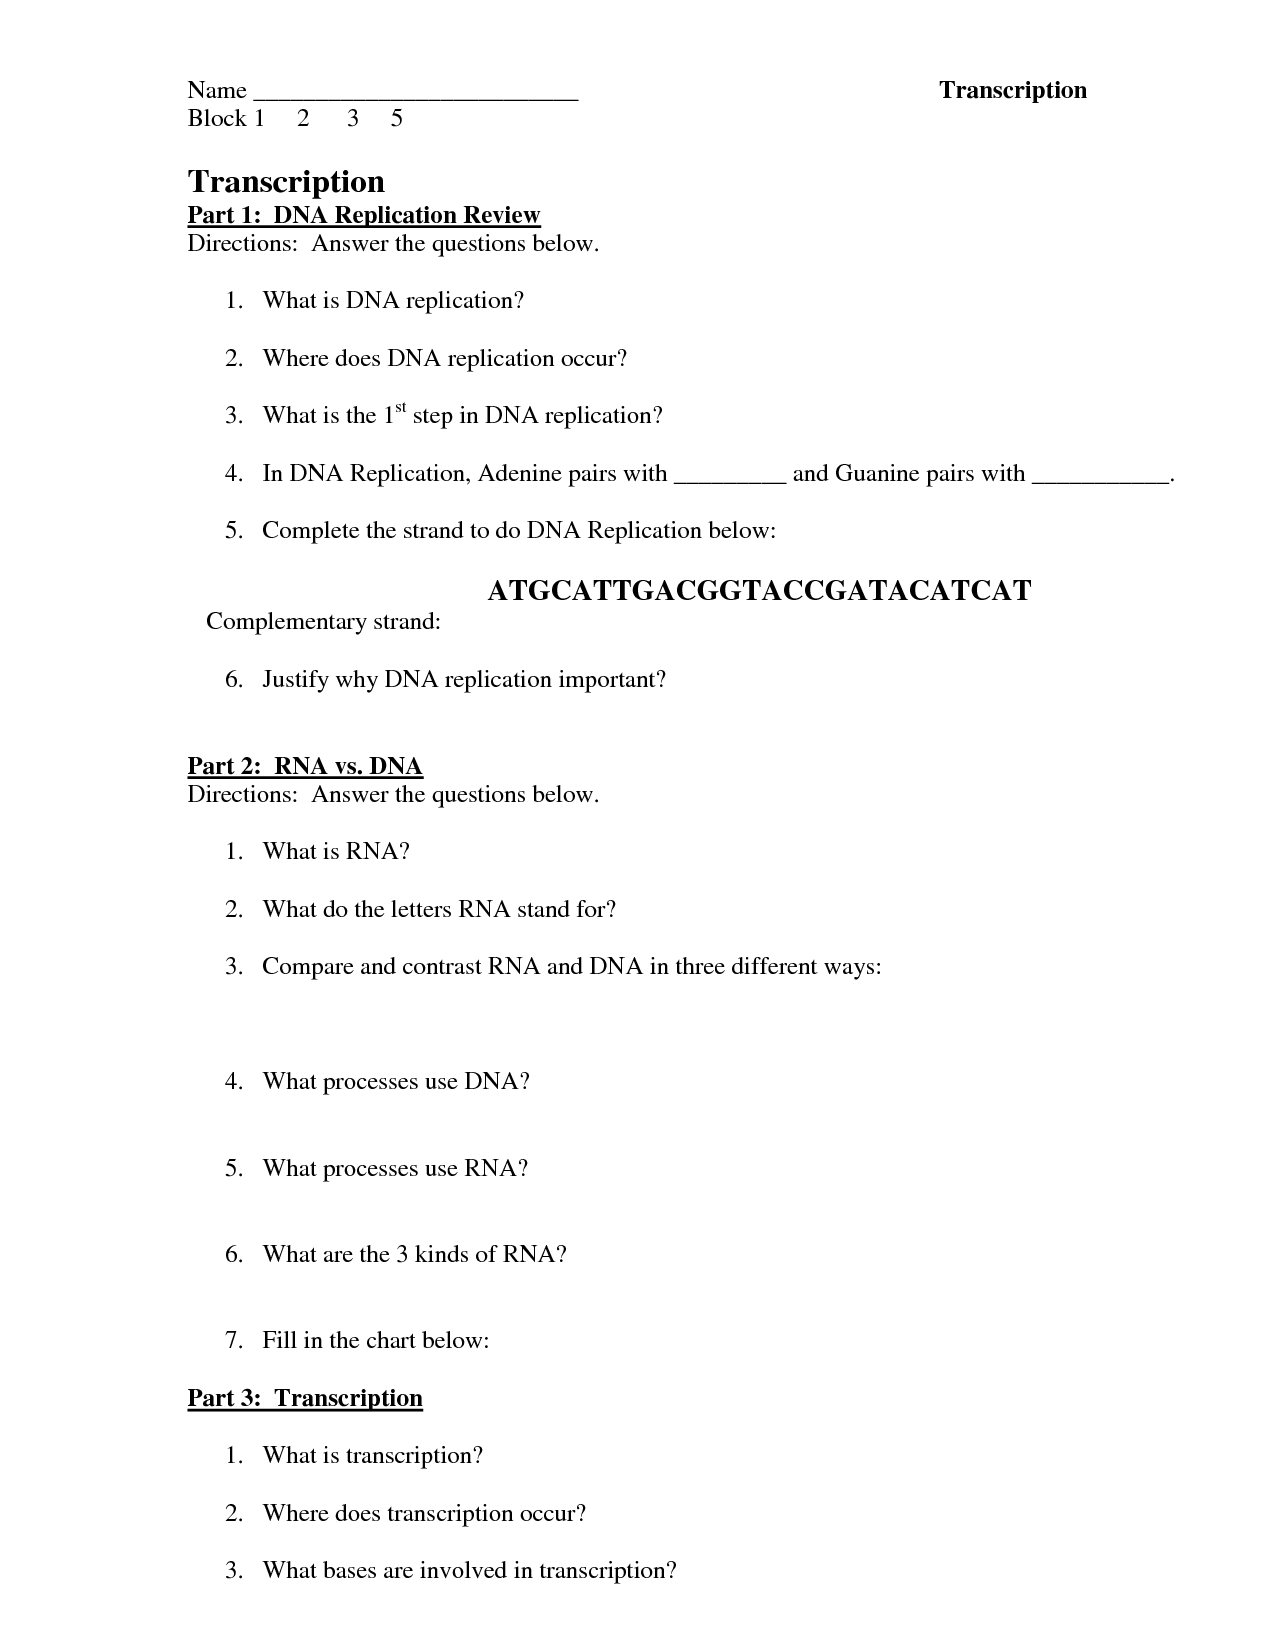 Transcription Worksheet Answers